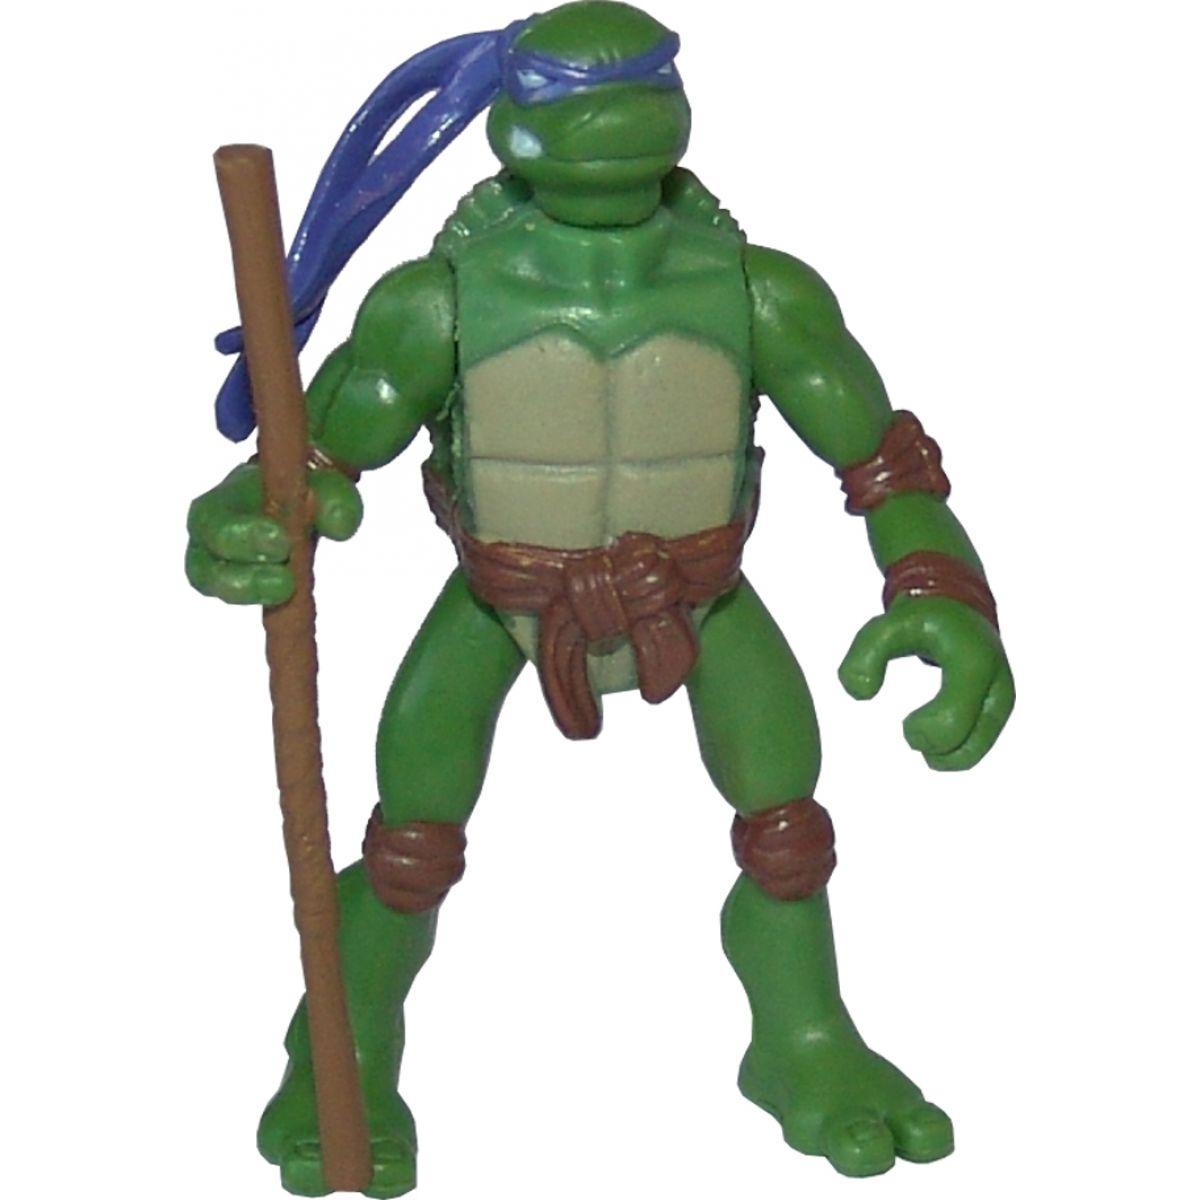 Želvy Ninja TMNT mini figurka 6 cm - Donatello